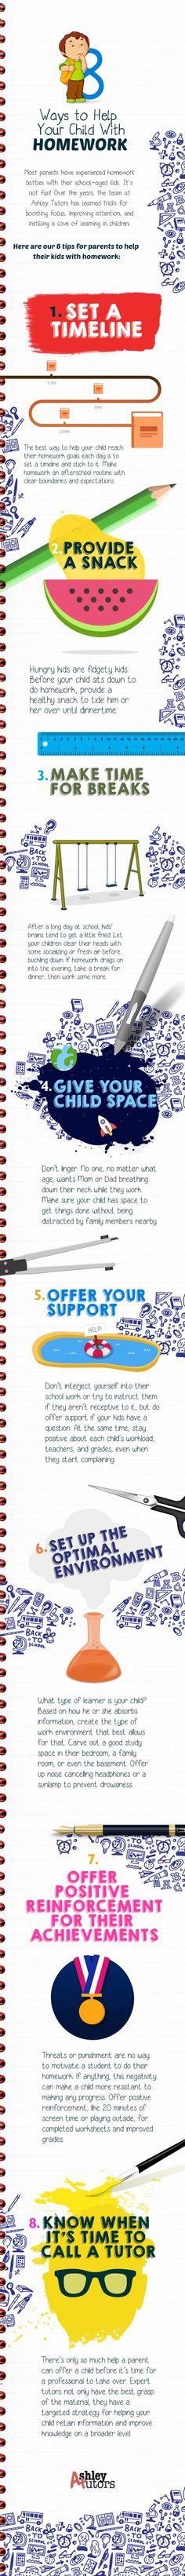 8-Ways-To-Help-Children-With-Homework-Infographic